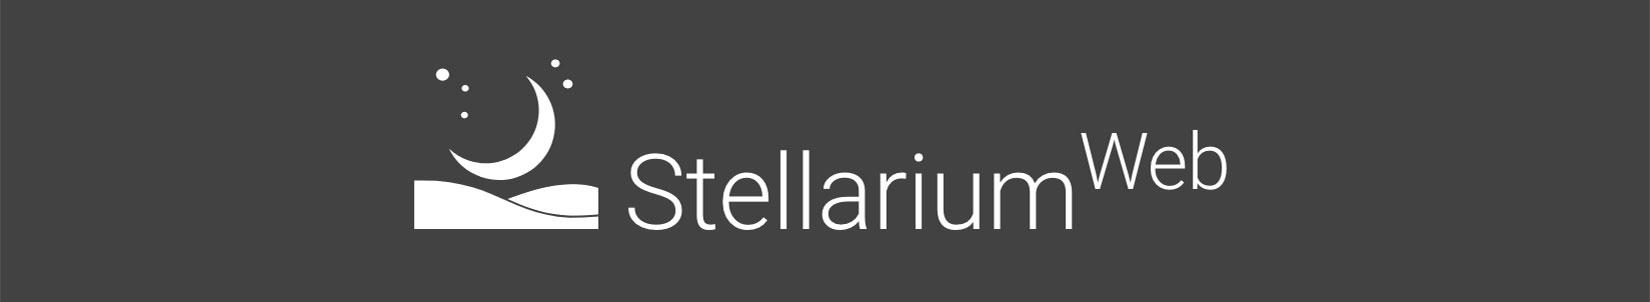 stellarium-web